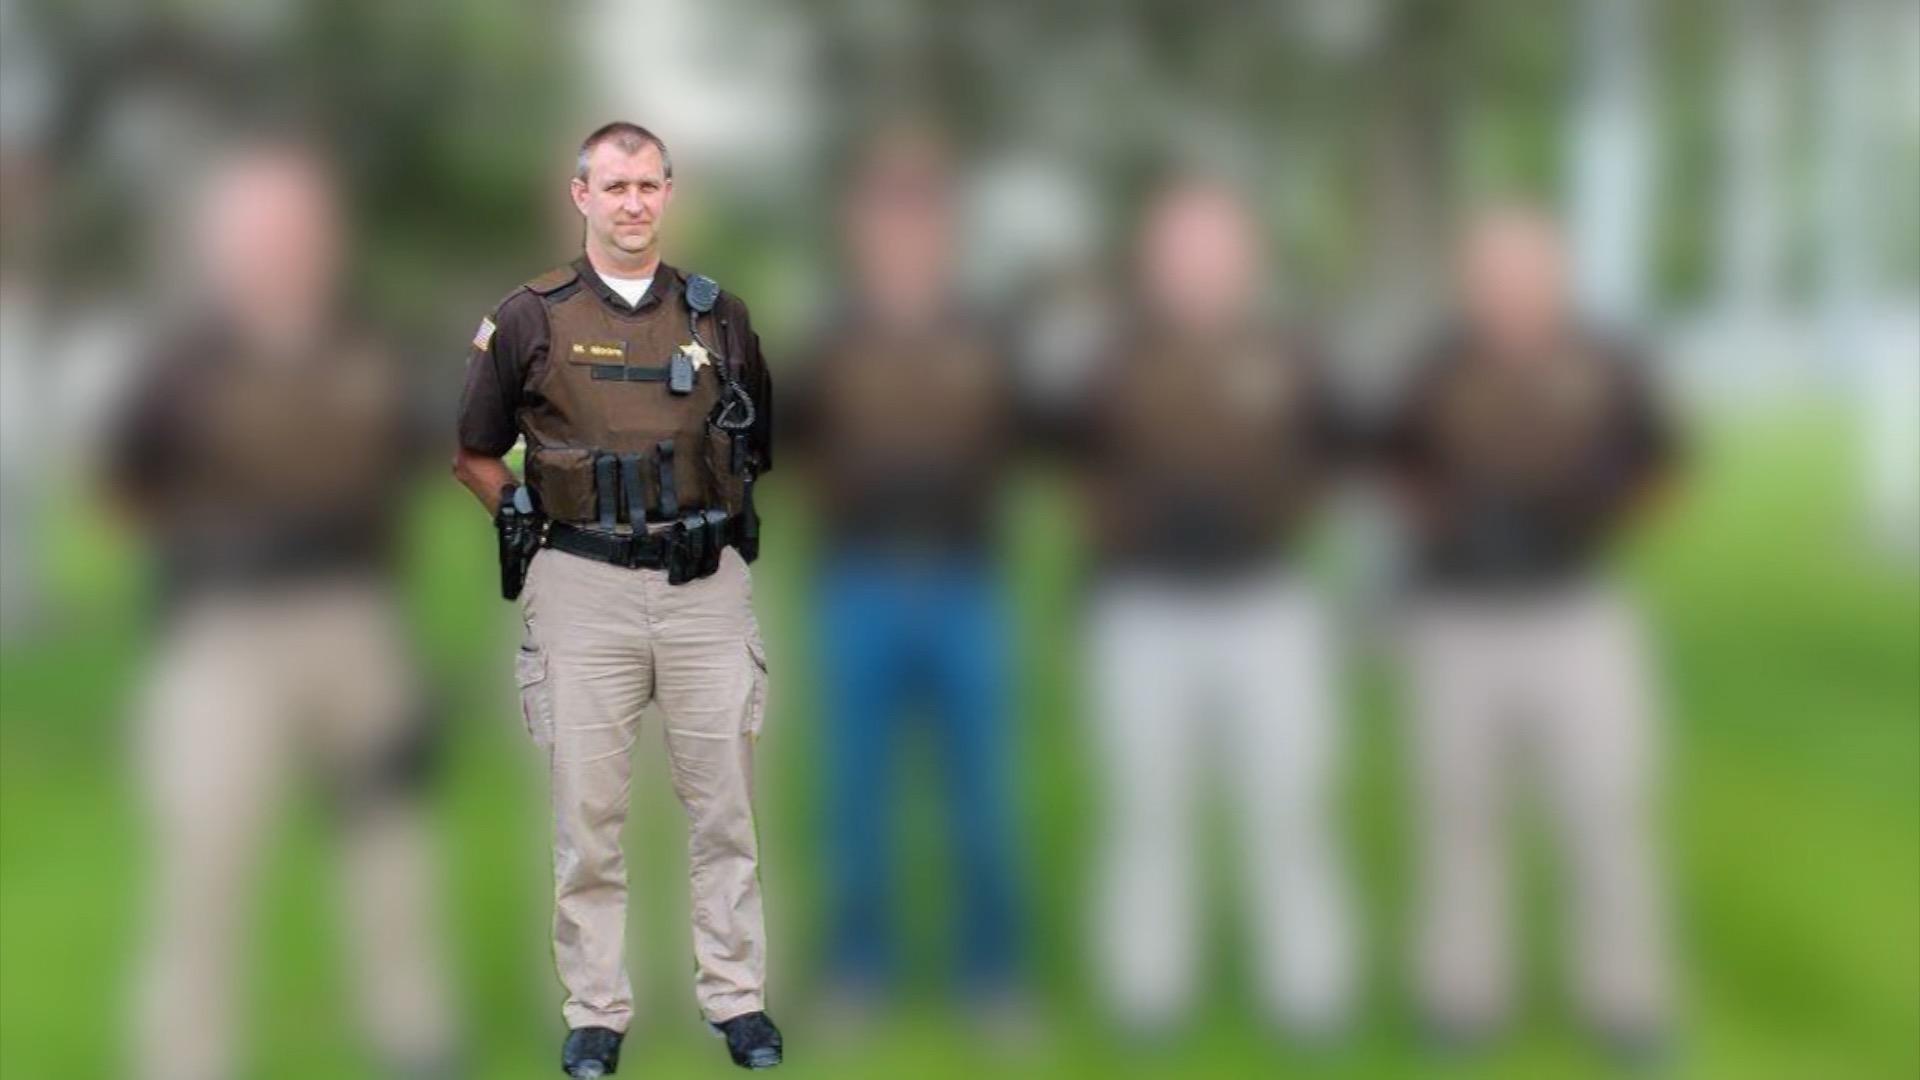 Broadwater County Deputy Mason Moore